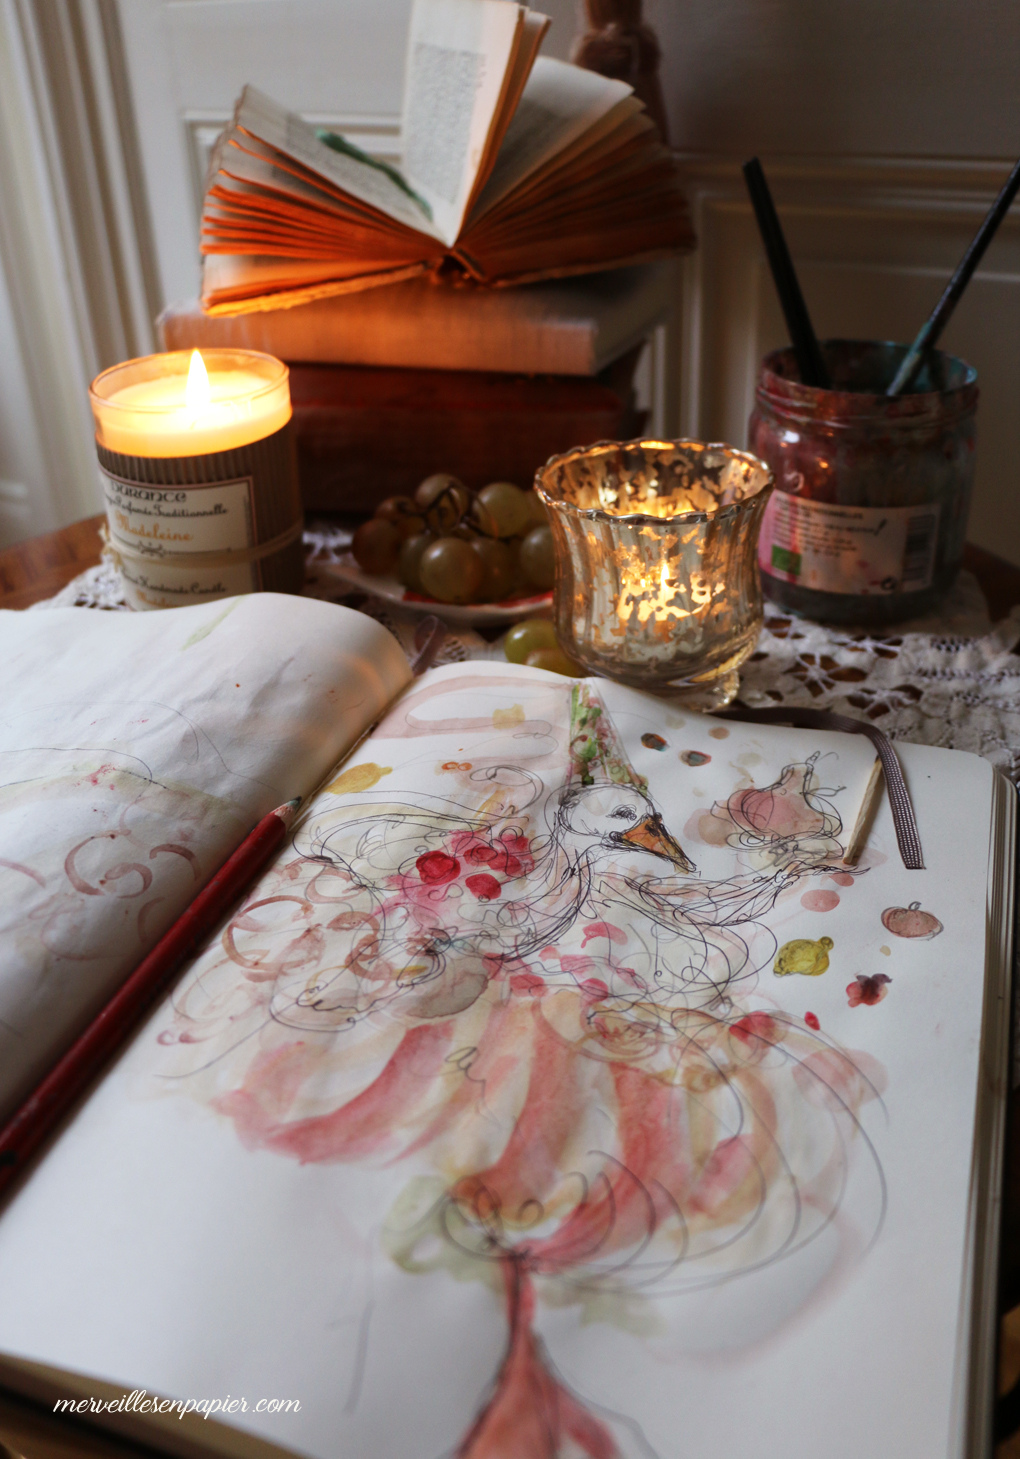 madame d'aulnoy's fairy tales